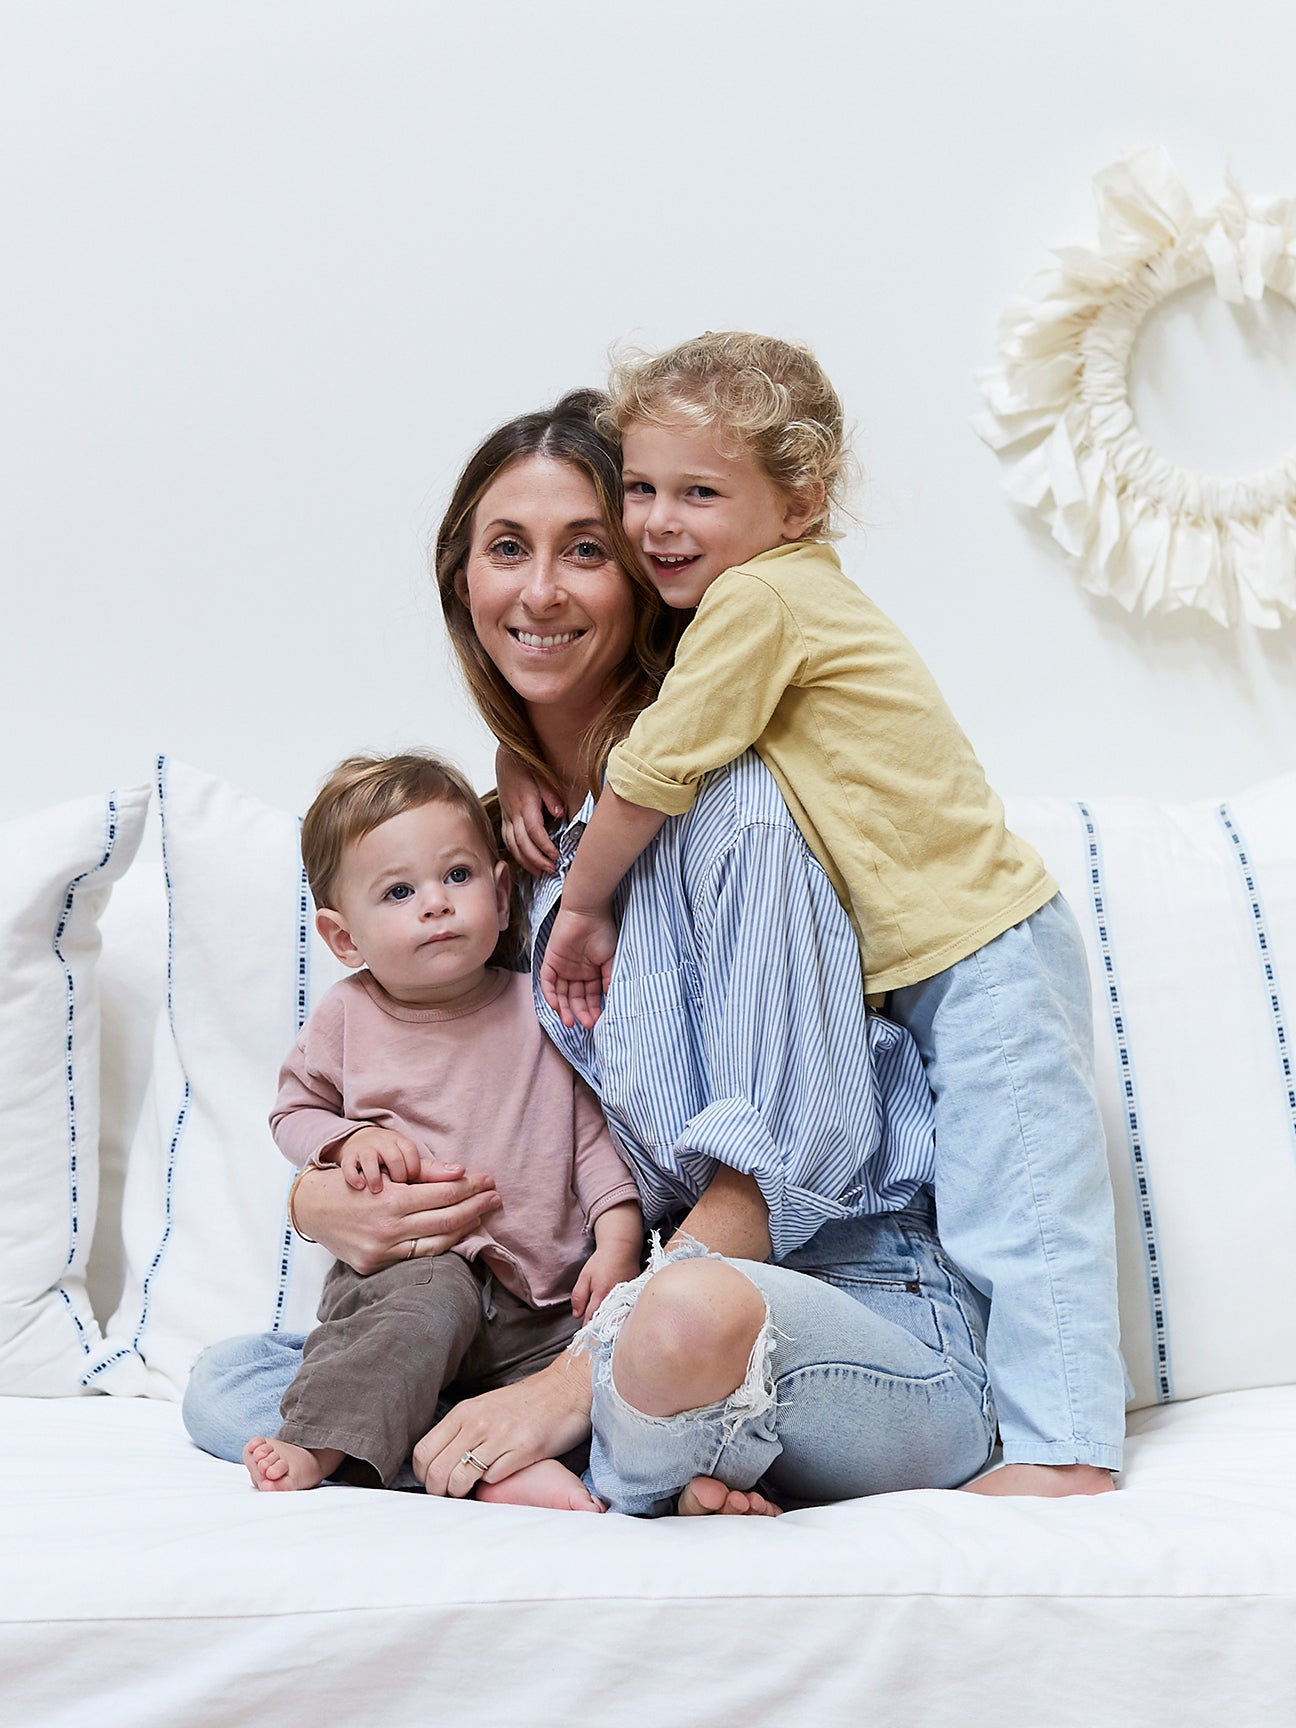 00-FEATURE-Hannah-Shargal-Nursery-Design-tips